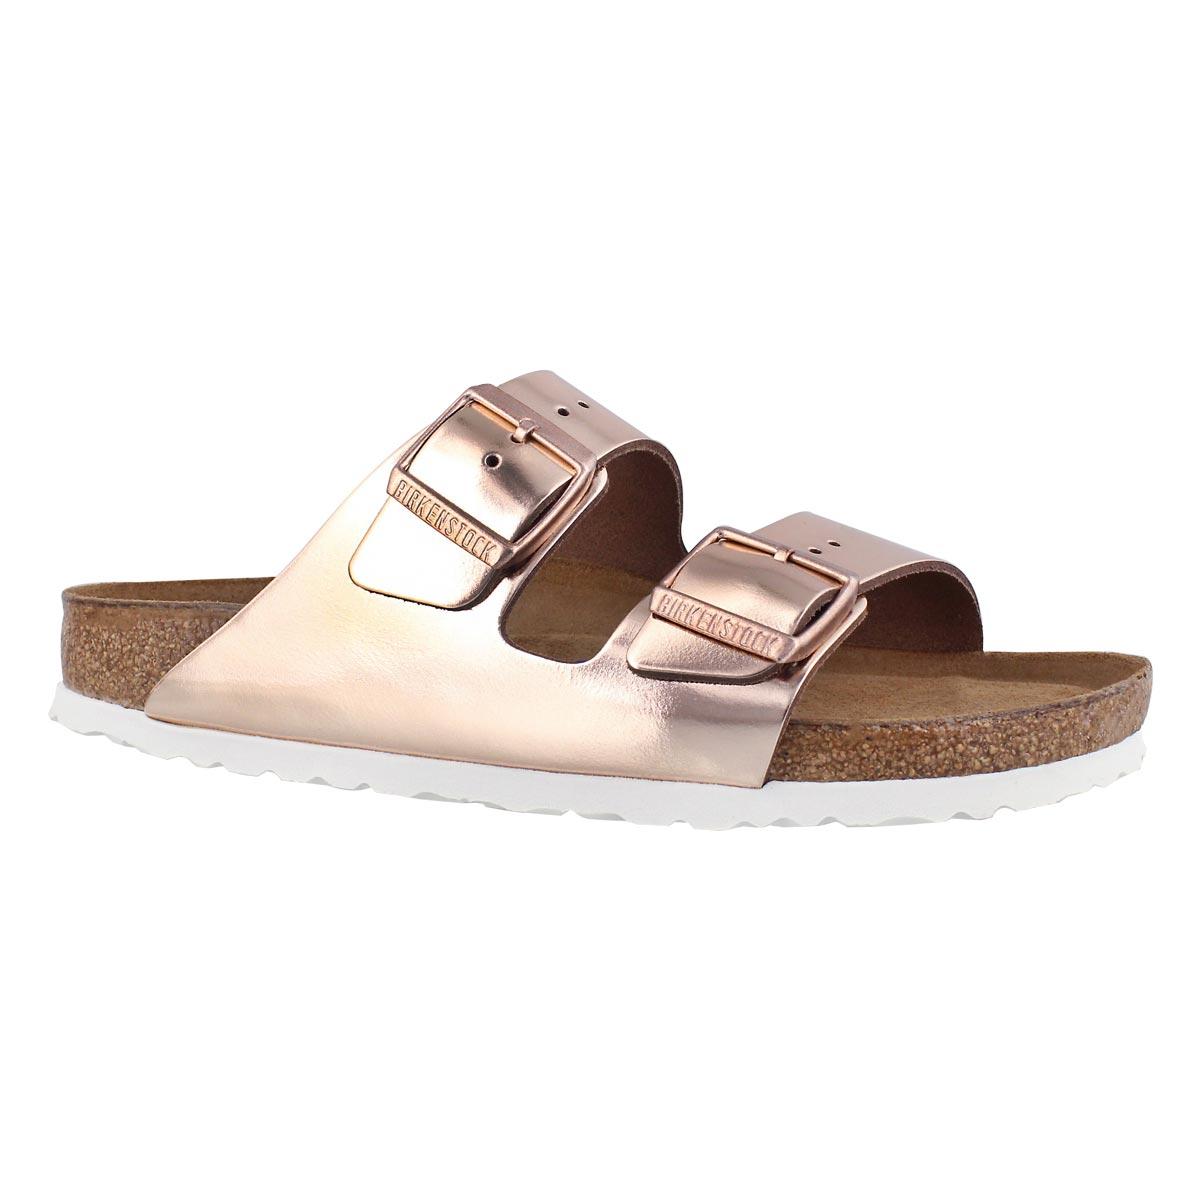 Women's ARIZONA LTR metallic cpr sandals -Narrow